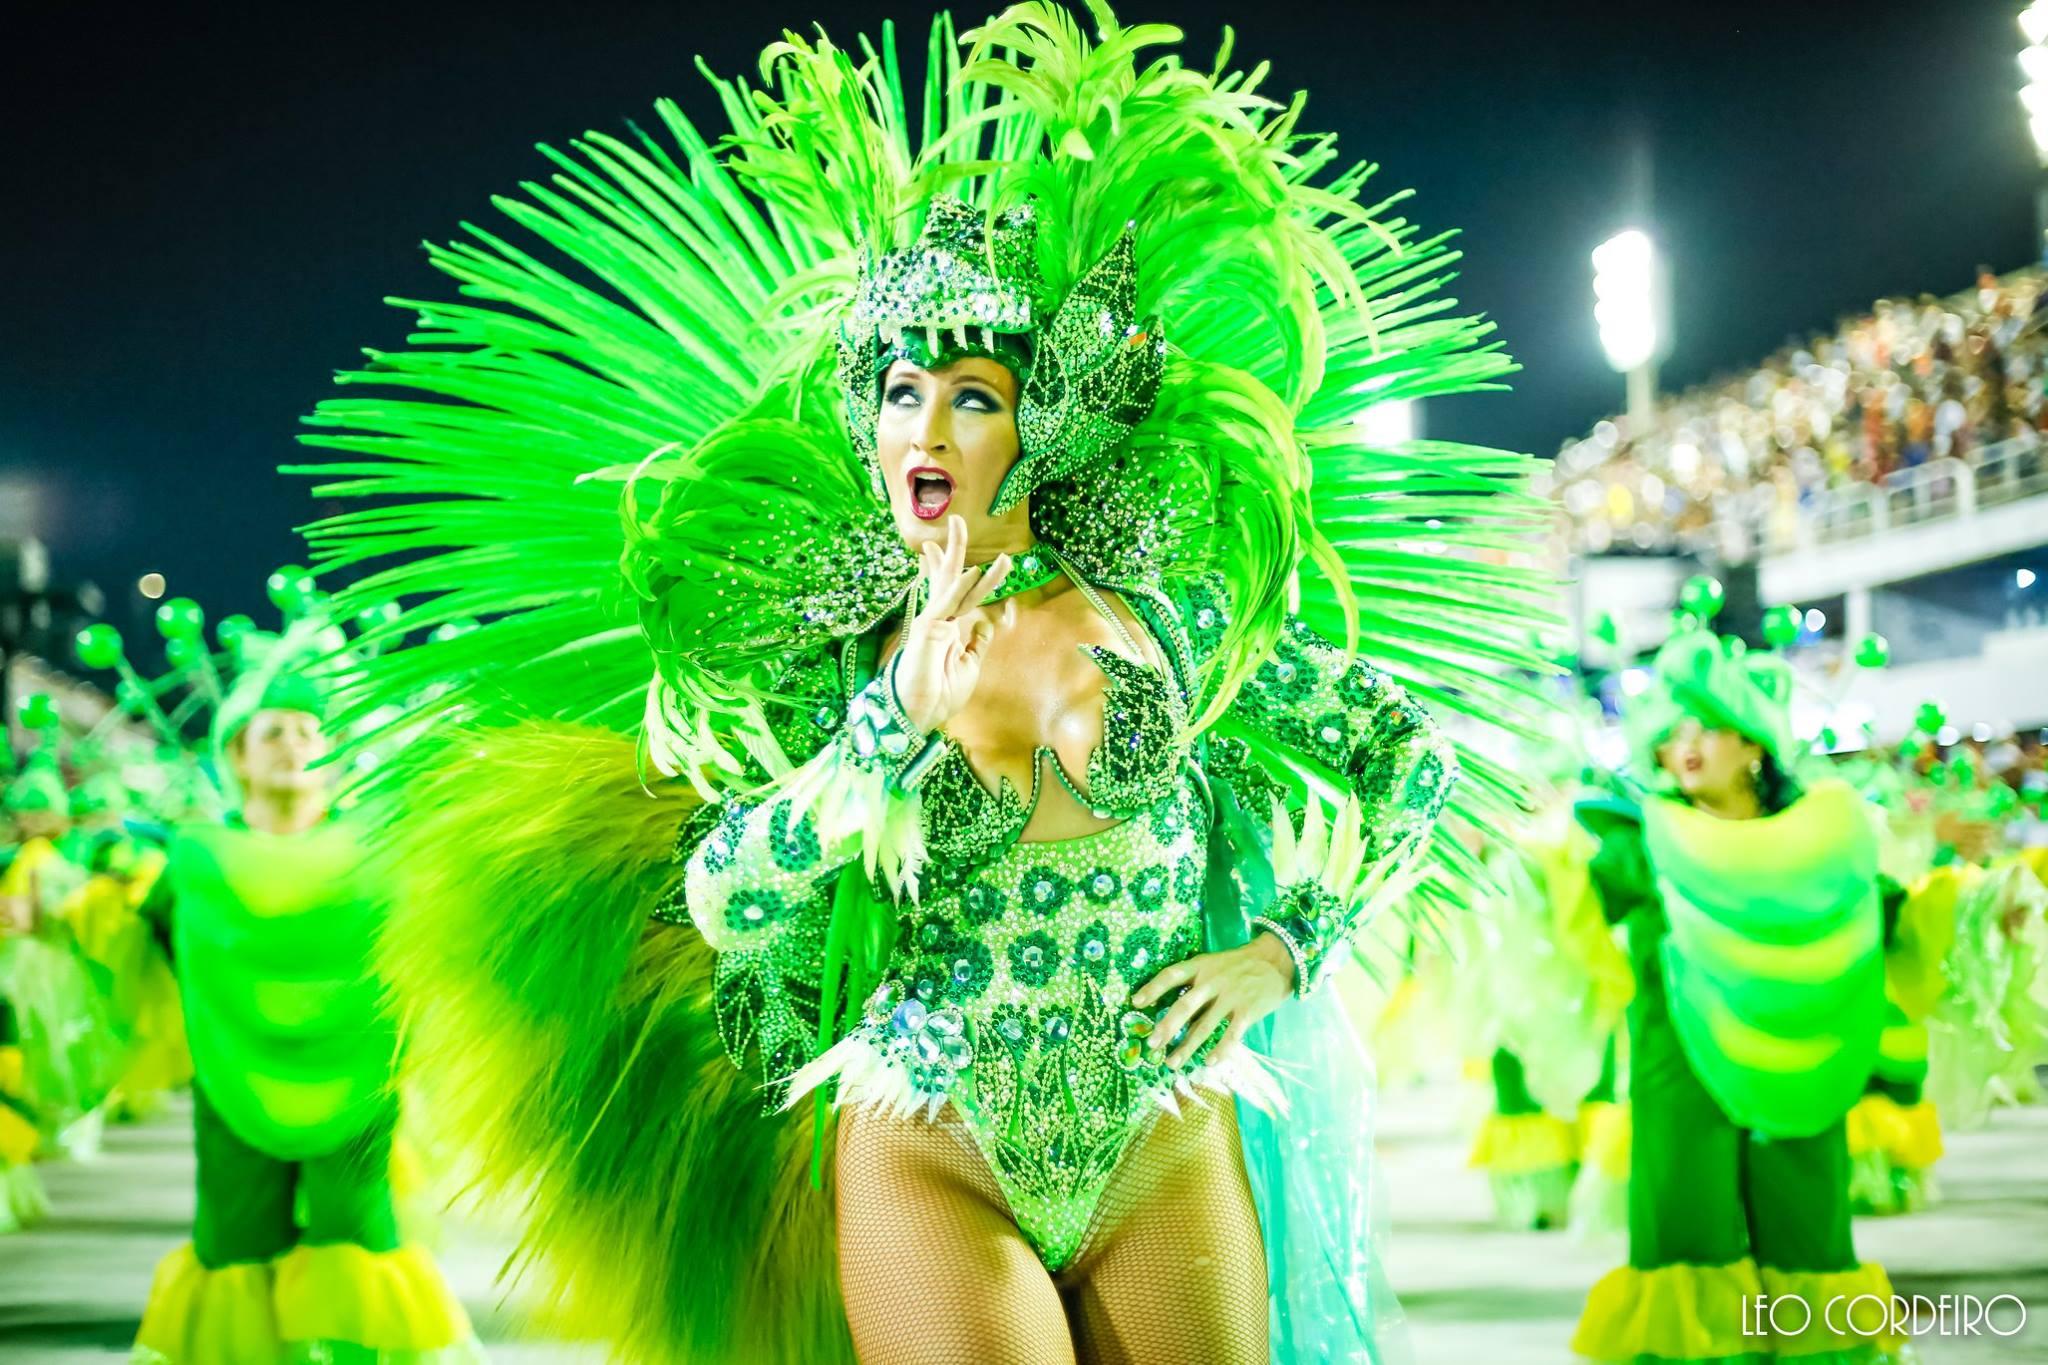 Founder & Musa Rio, Carnaval 2018